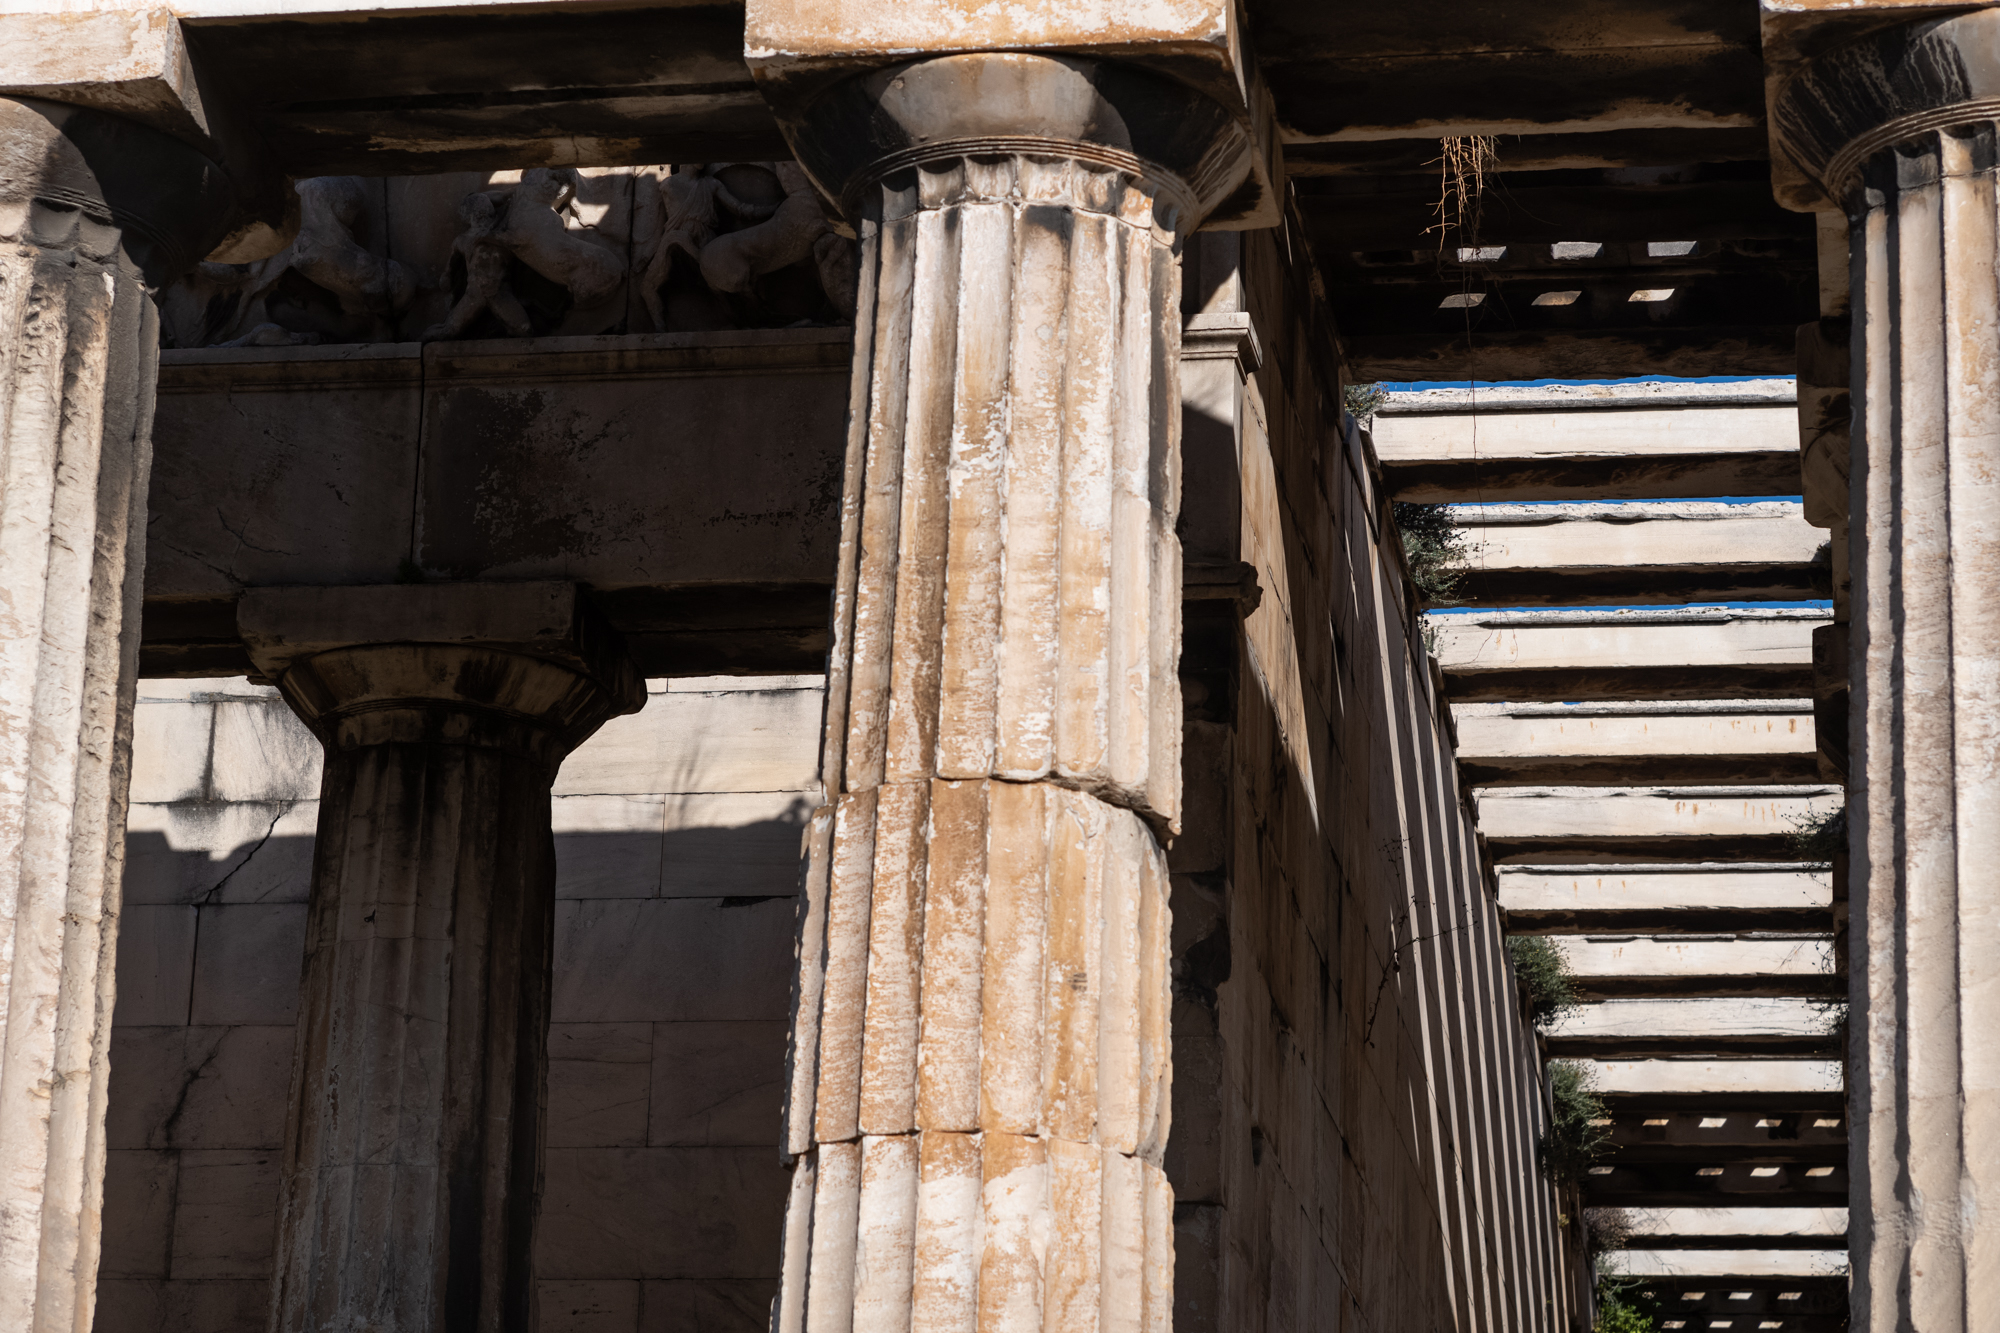 Columns of the Temple of Hephaestus